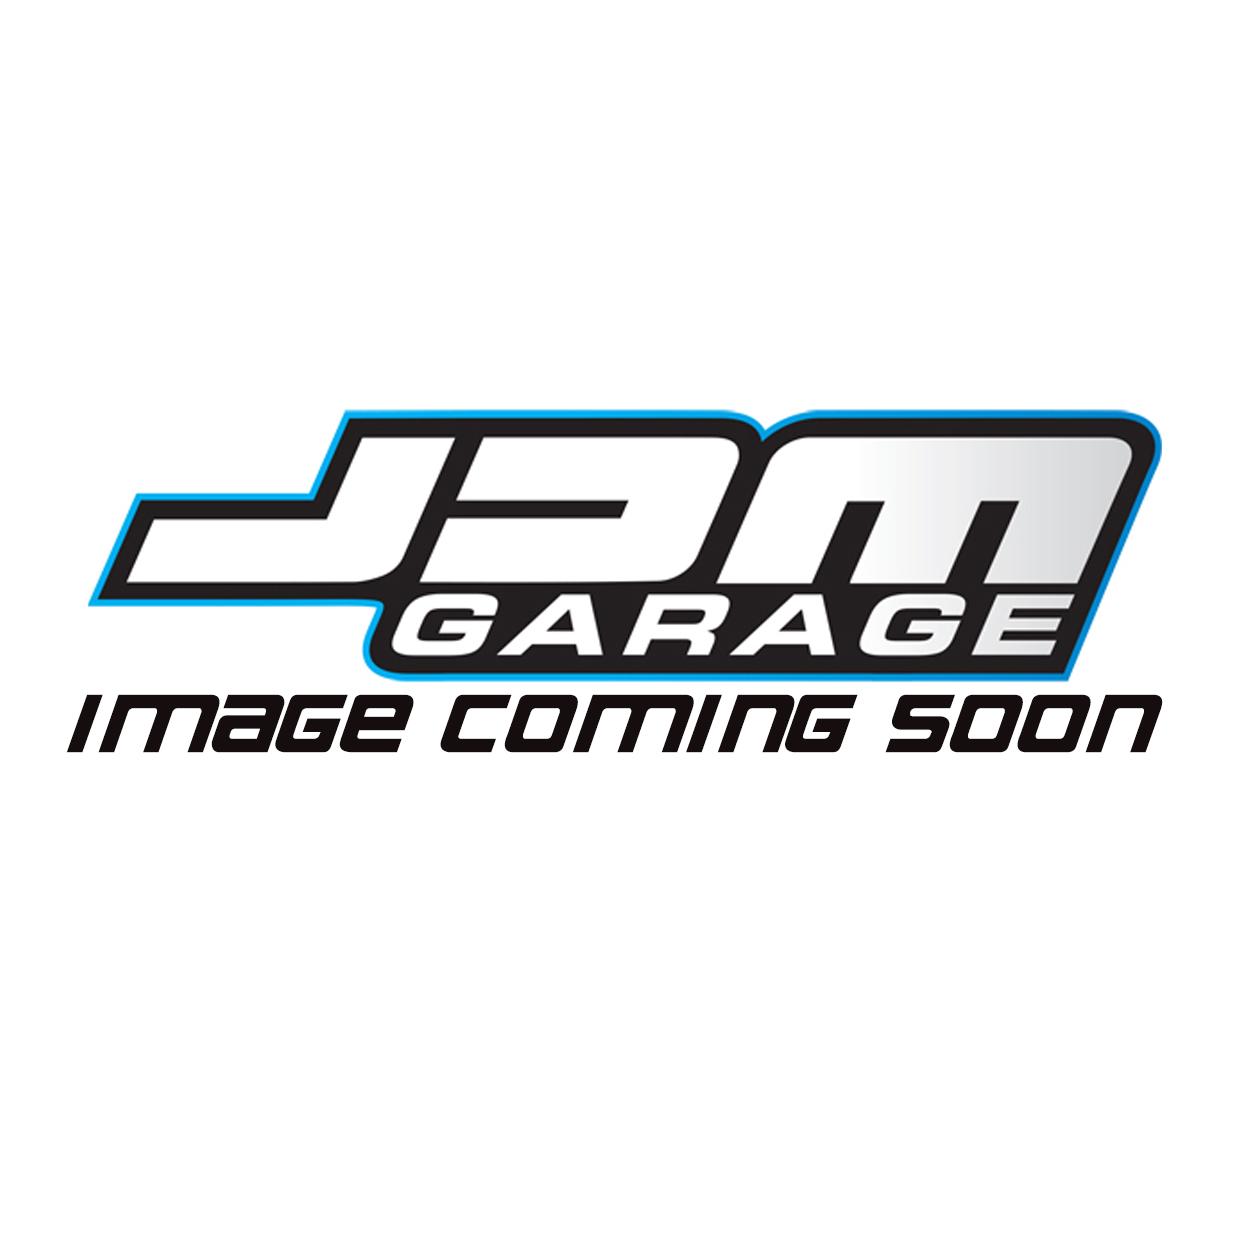 Genuine Nissan OEM RB25DET Gearbox Speed Sensor Fits Nissan Skyline R33 GTST / R34 GTT 25010-21U00